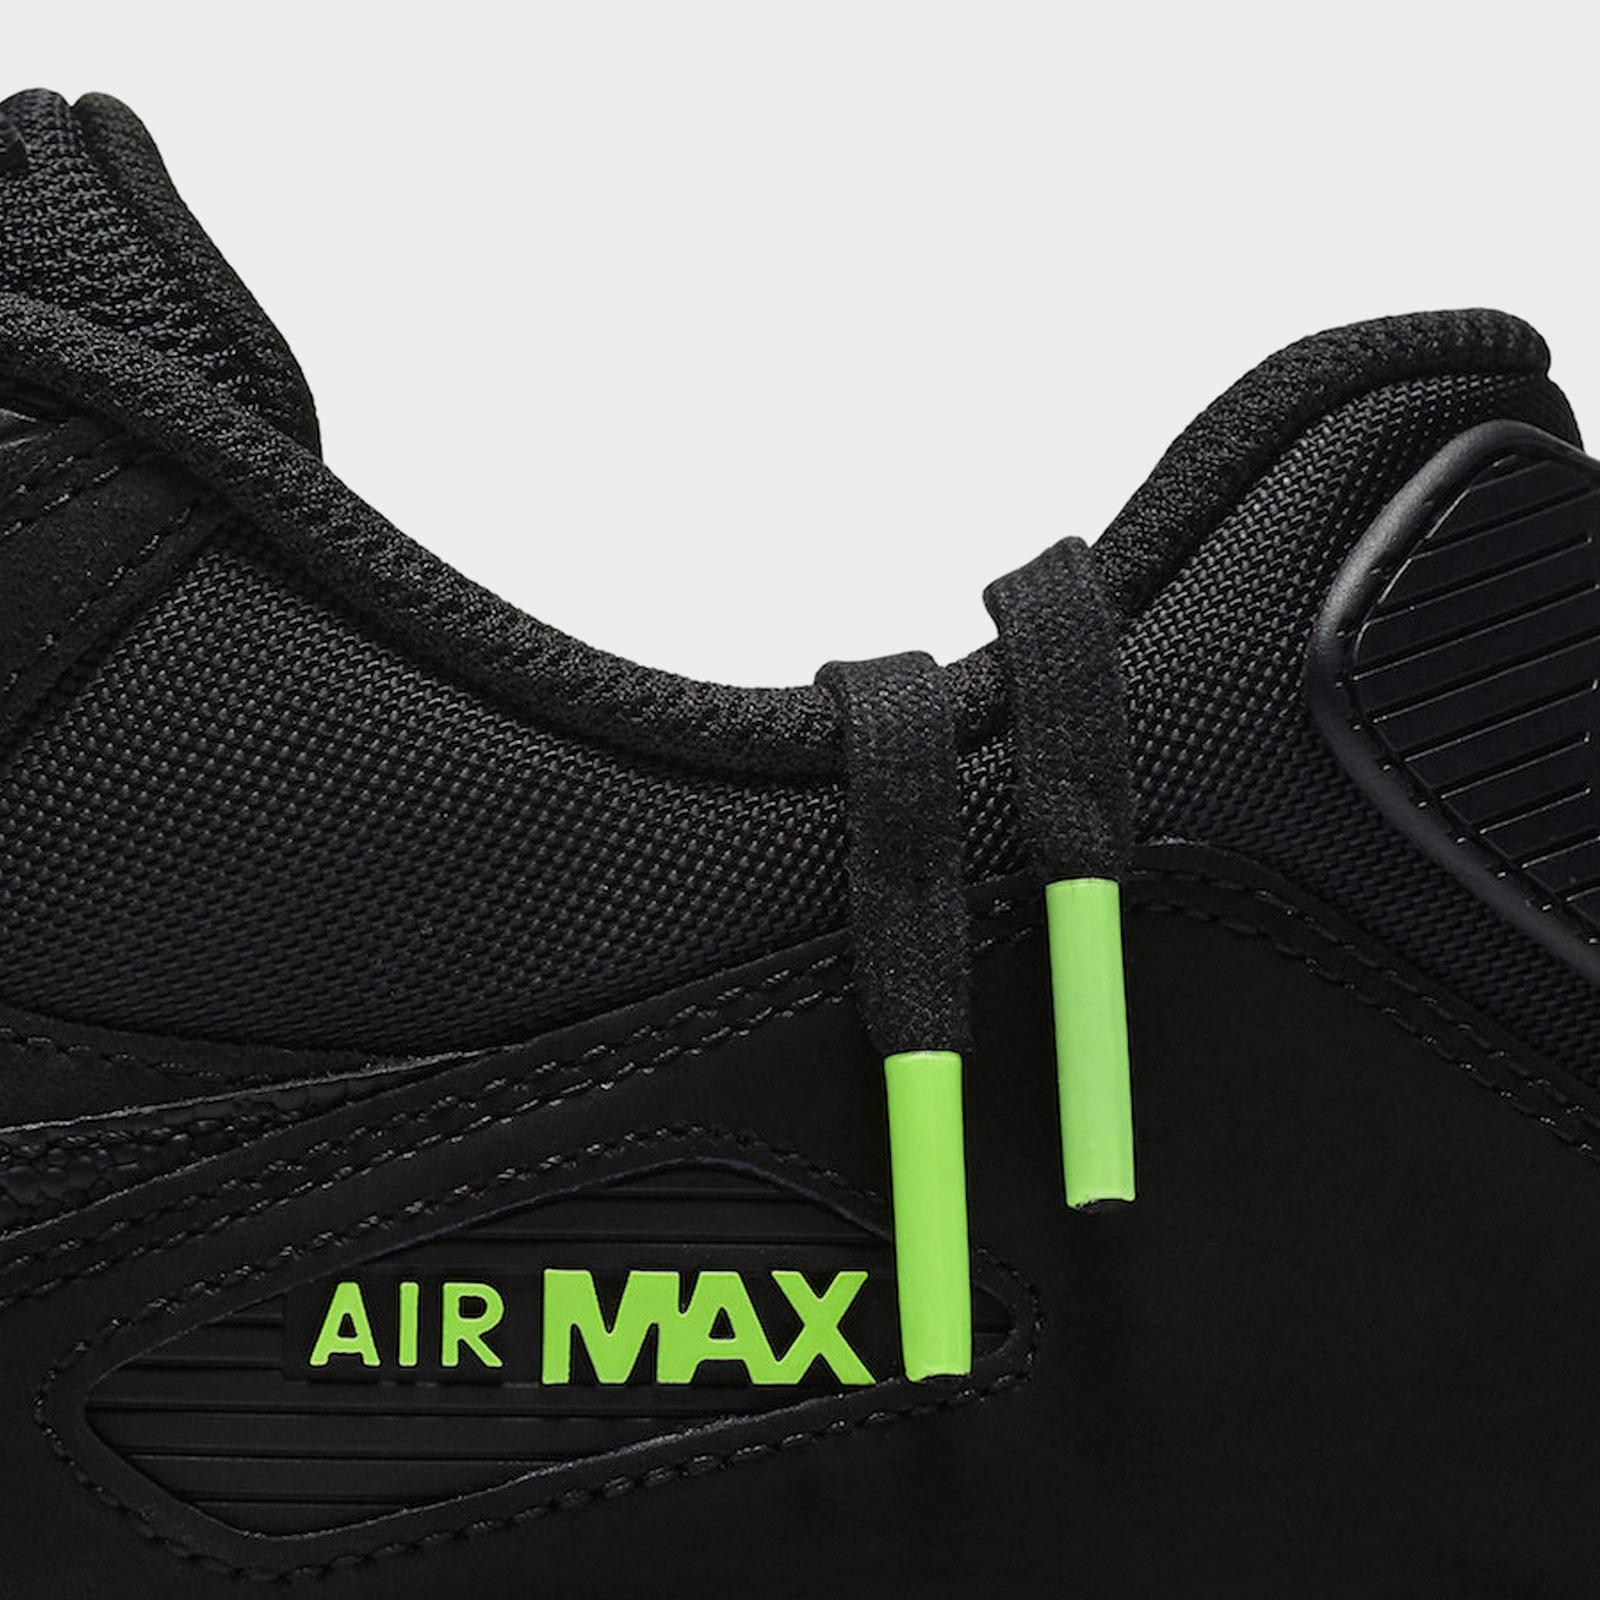 Nike Air Max 90 Aq6101 001 Sneakersnstuff   sneakers